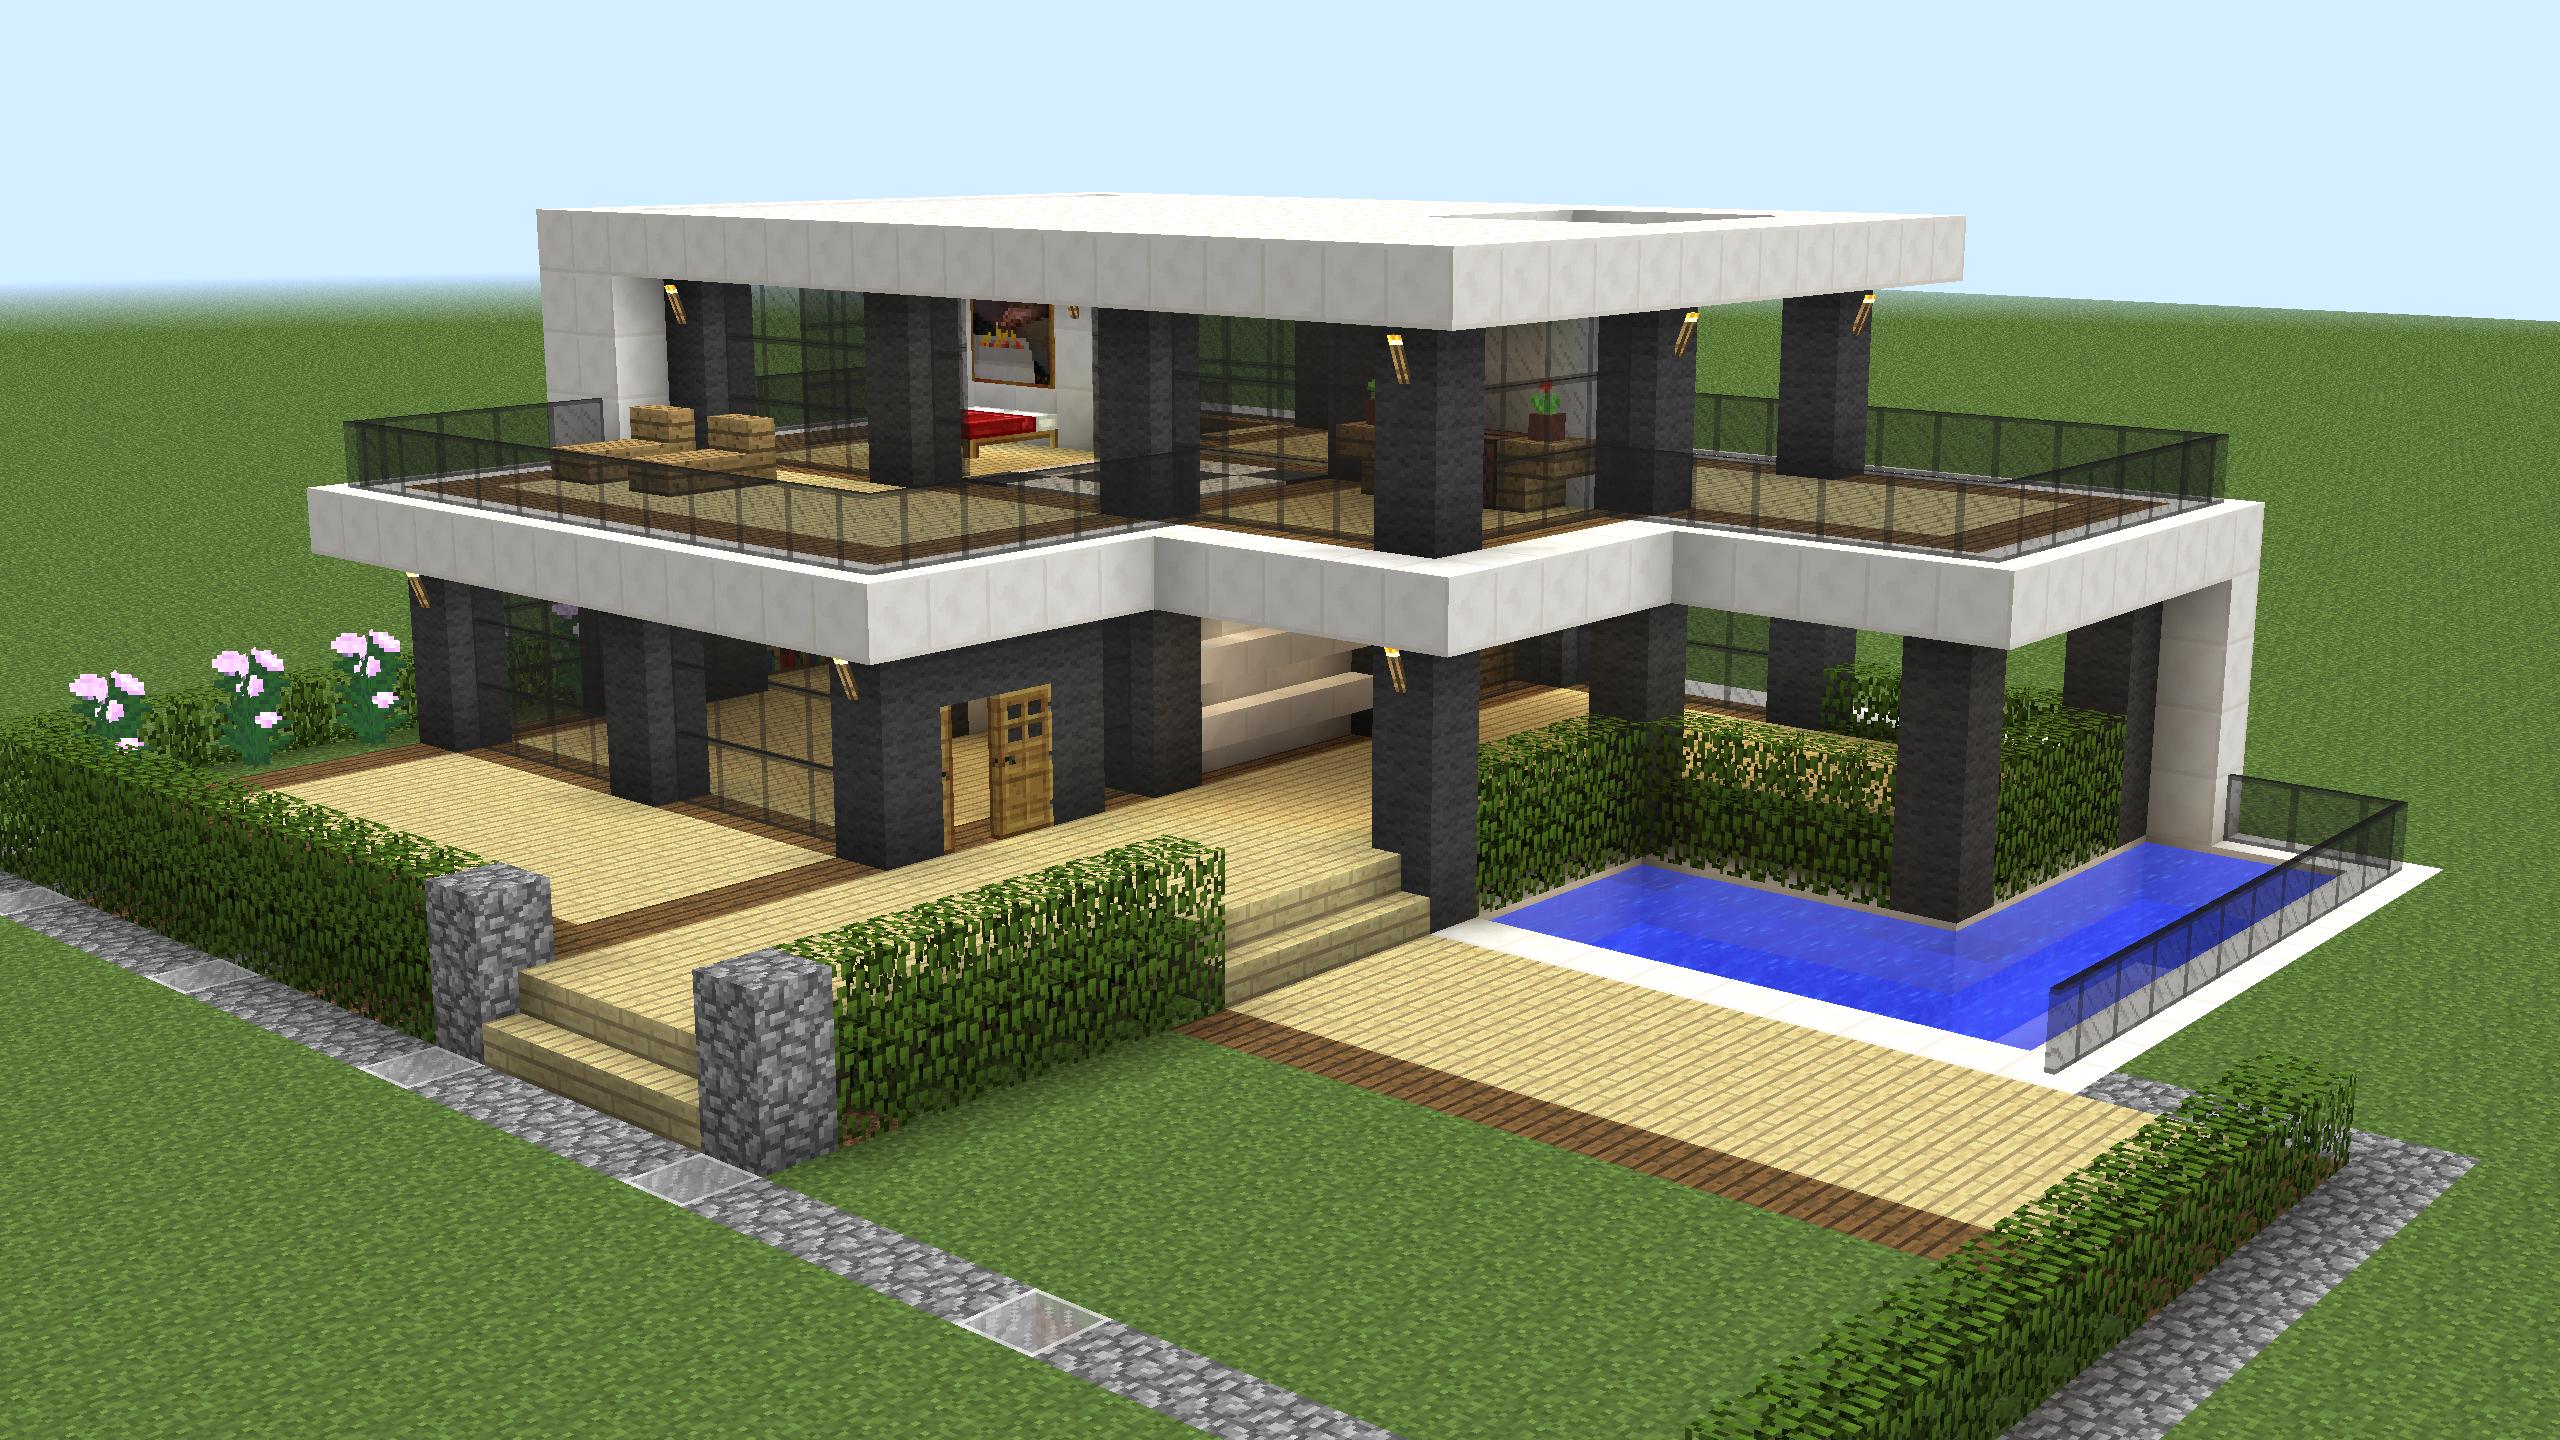 как построить модерн дома в майнкрафте 1.7.2 видео #10